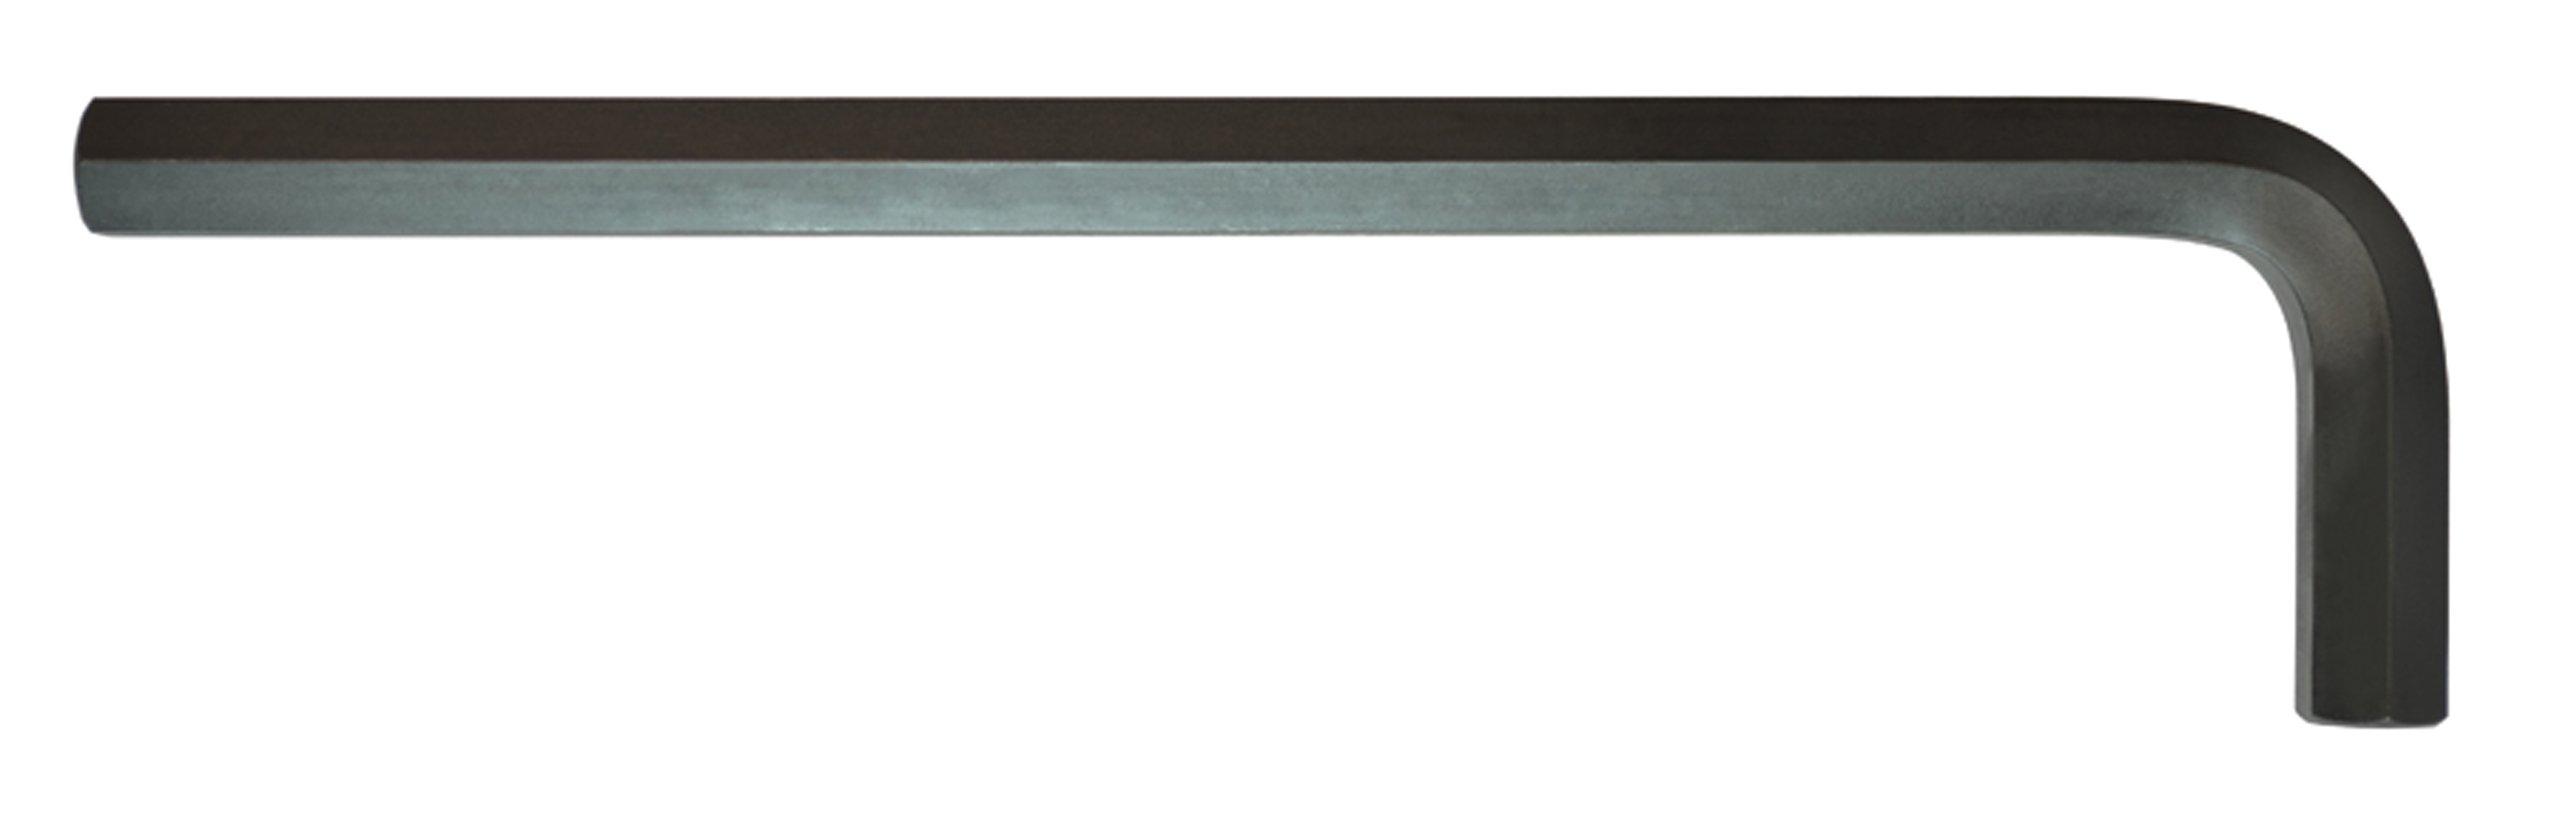 DealMux 4mm Hex Key L-Shape Internal Hexagon Metal Wrenches Silver Tone 20 Pcs